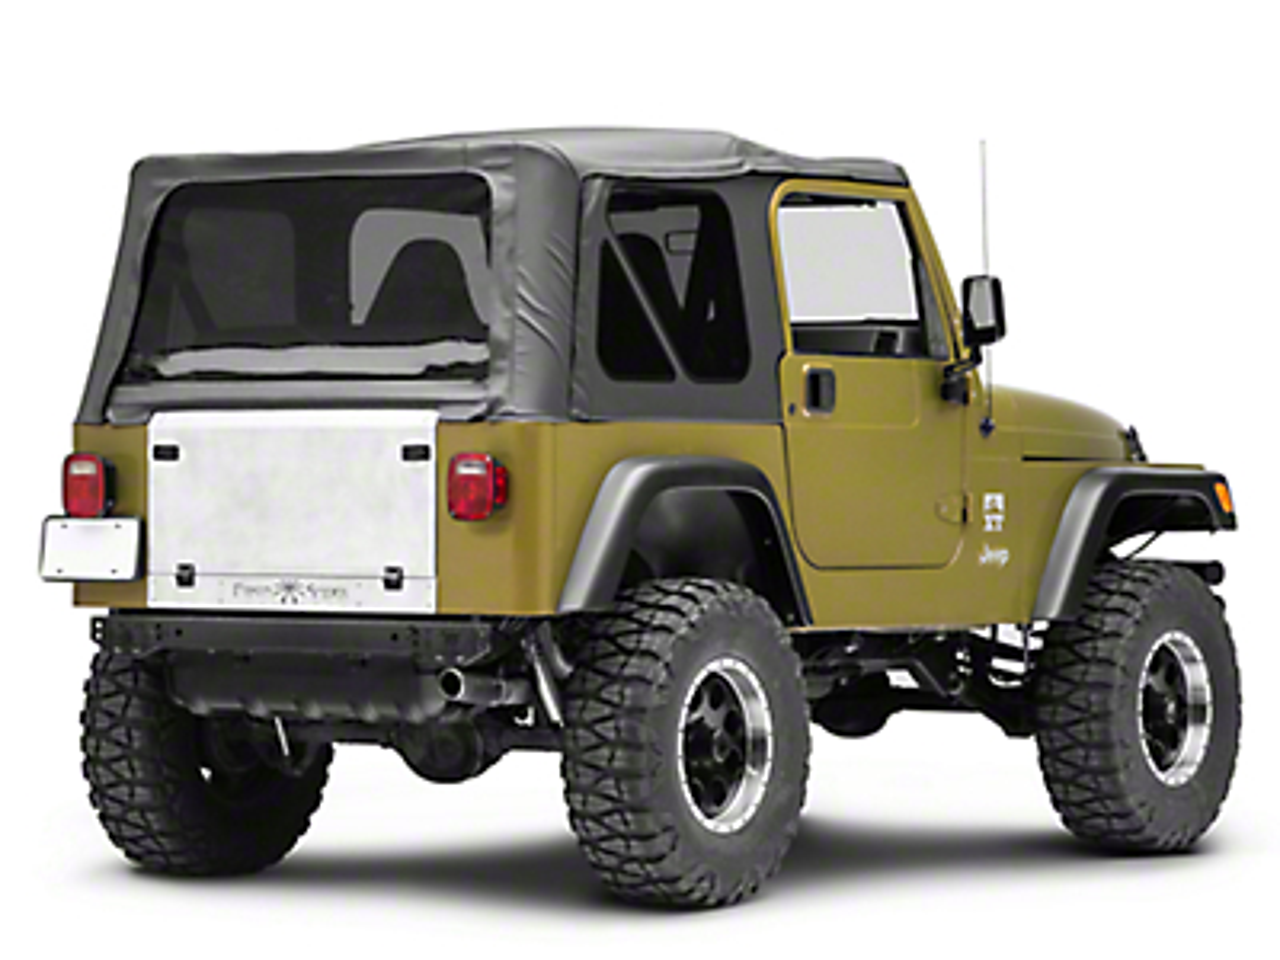 Poison Spyder Trail Gate (97-06 Jeep Wrangler TJ)